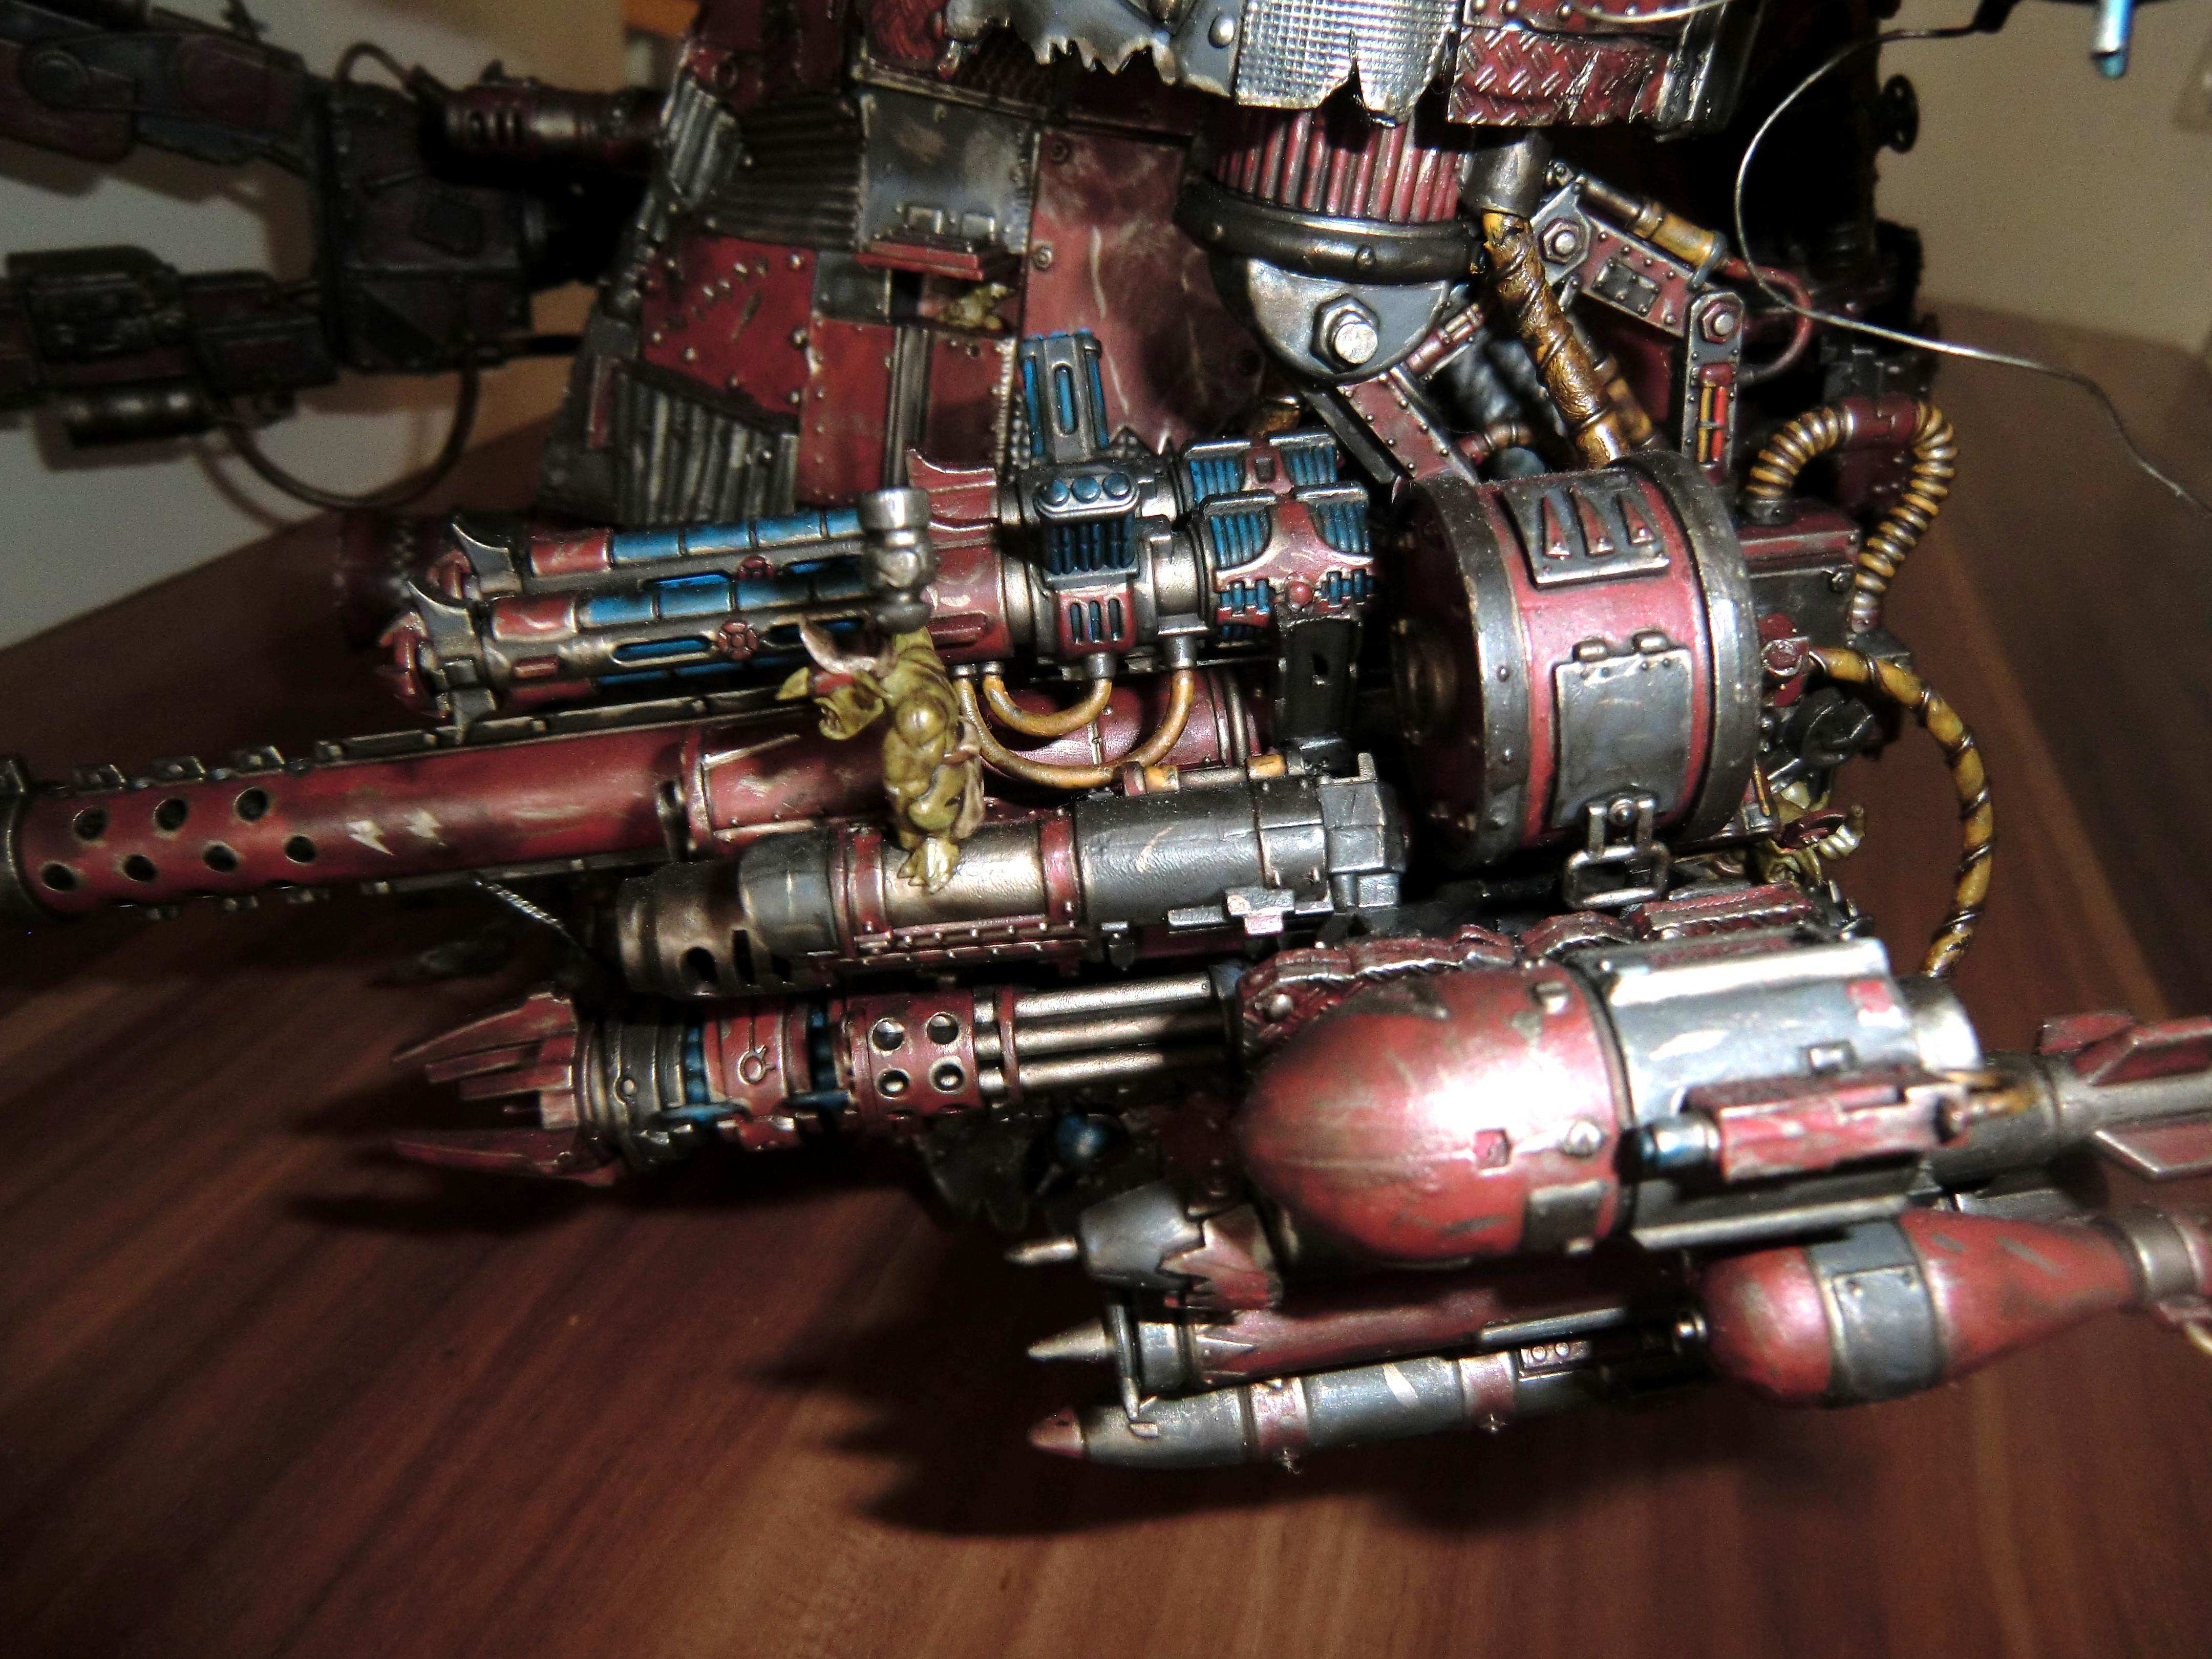 Evil Sunz, Forge World, Great Gargant, Mekboy Gargant, Orks, Stompa, Warhammer 40,000